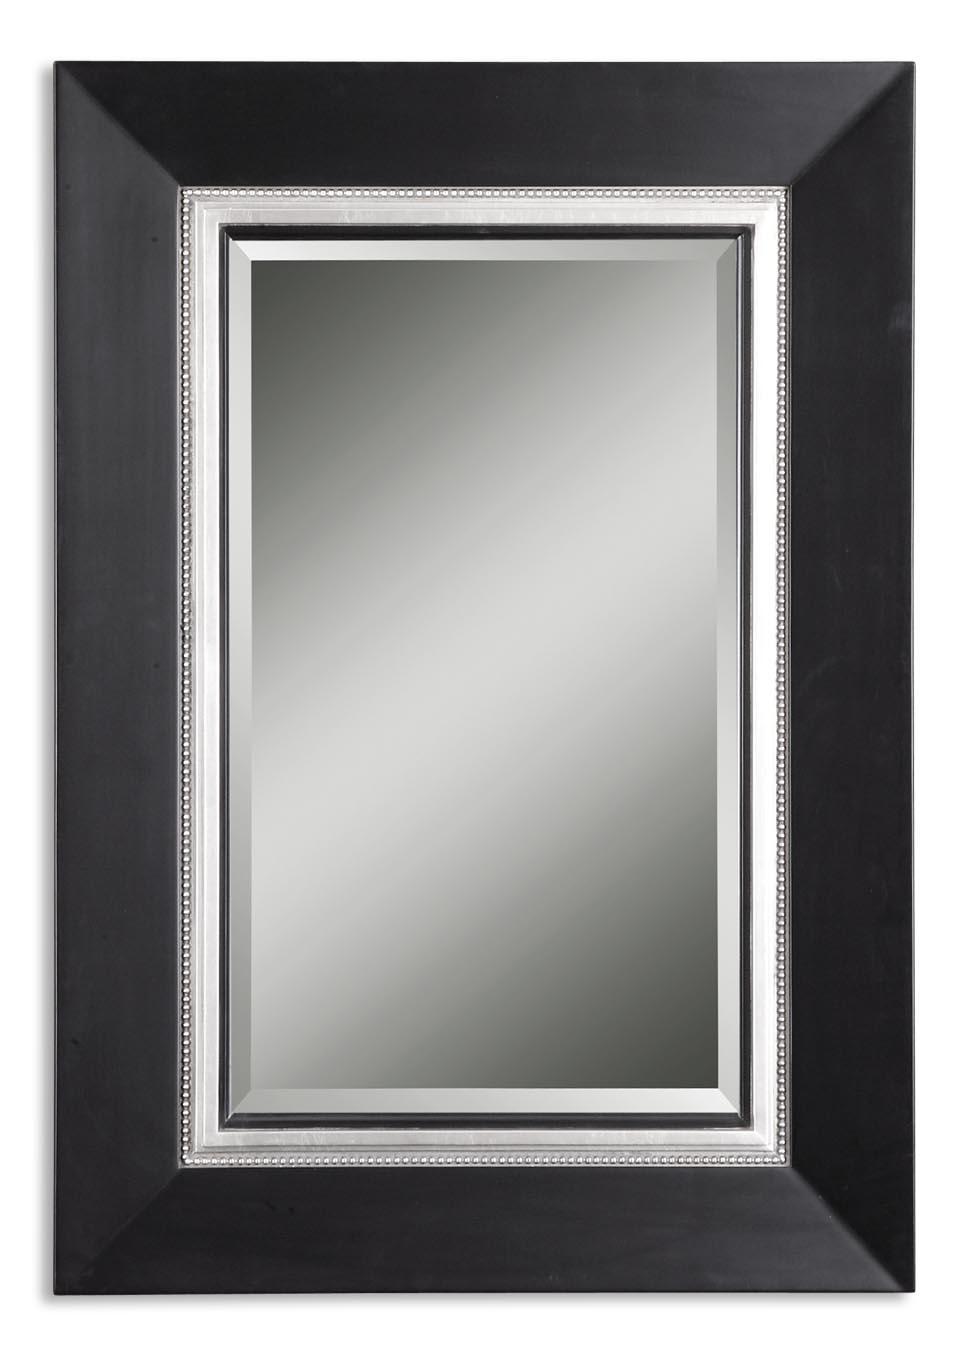 Uttermost MirrorsWhitmore Vanity; Uttermost MirrorsWhitmore Vanity